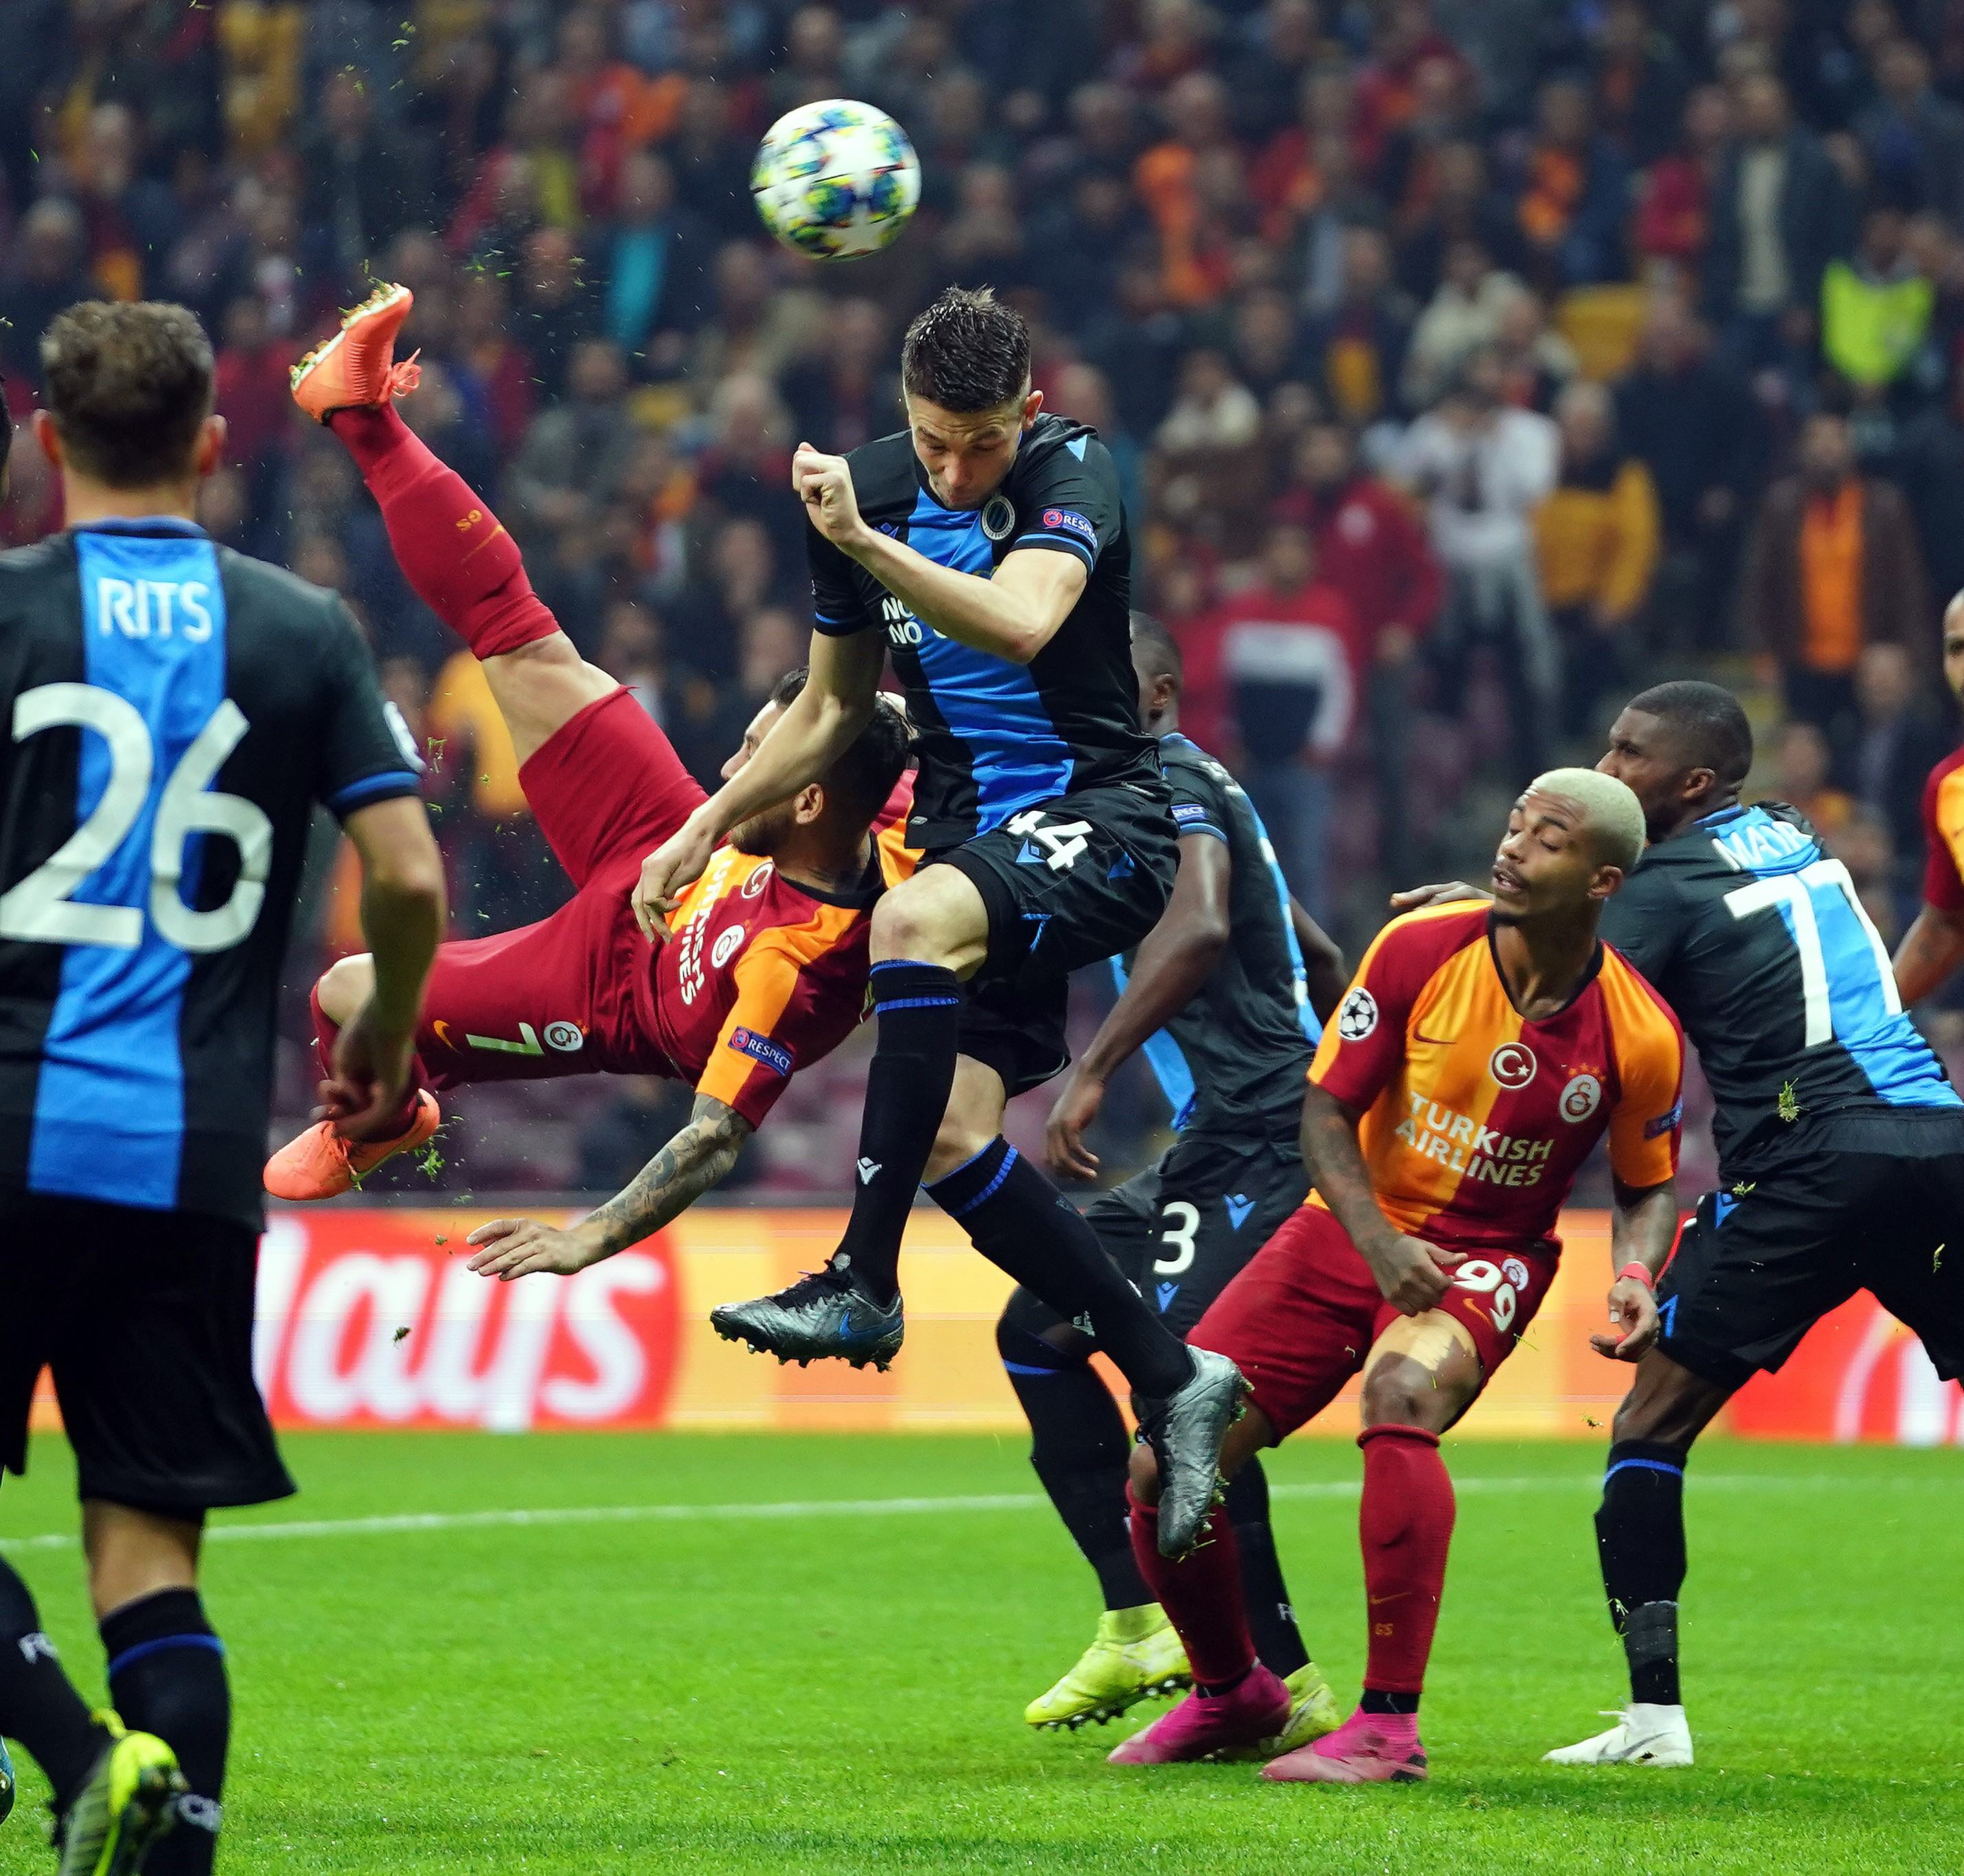 Brugge Galatasaray